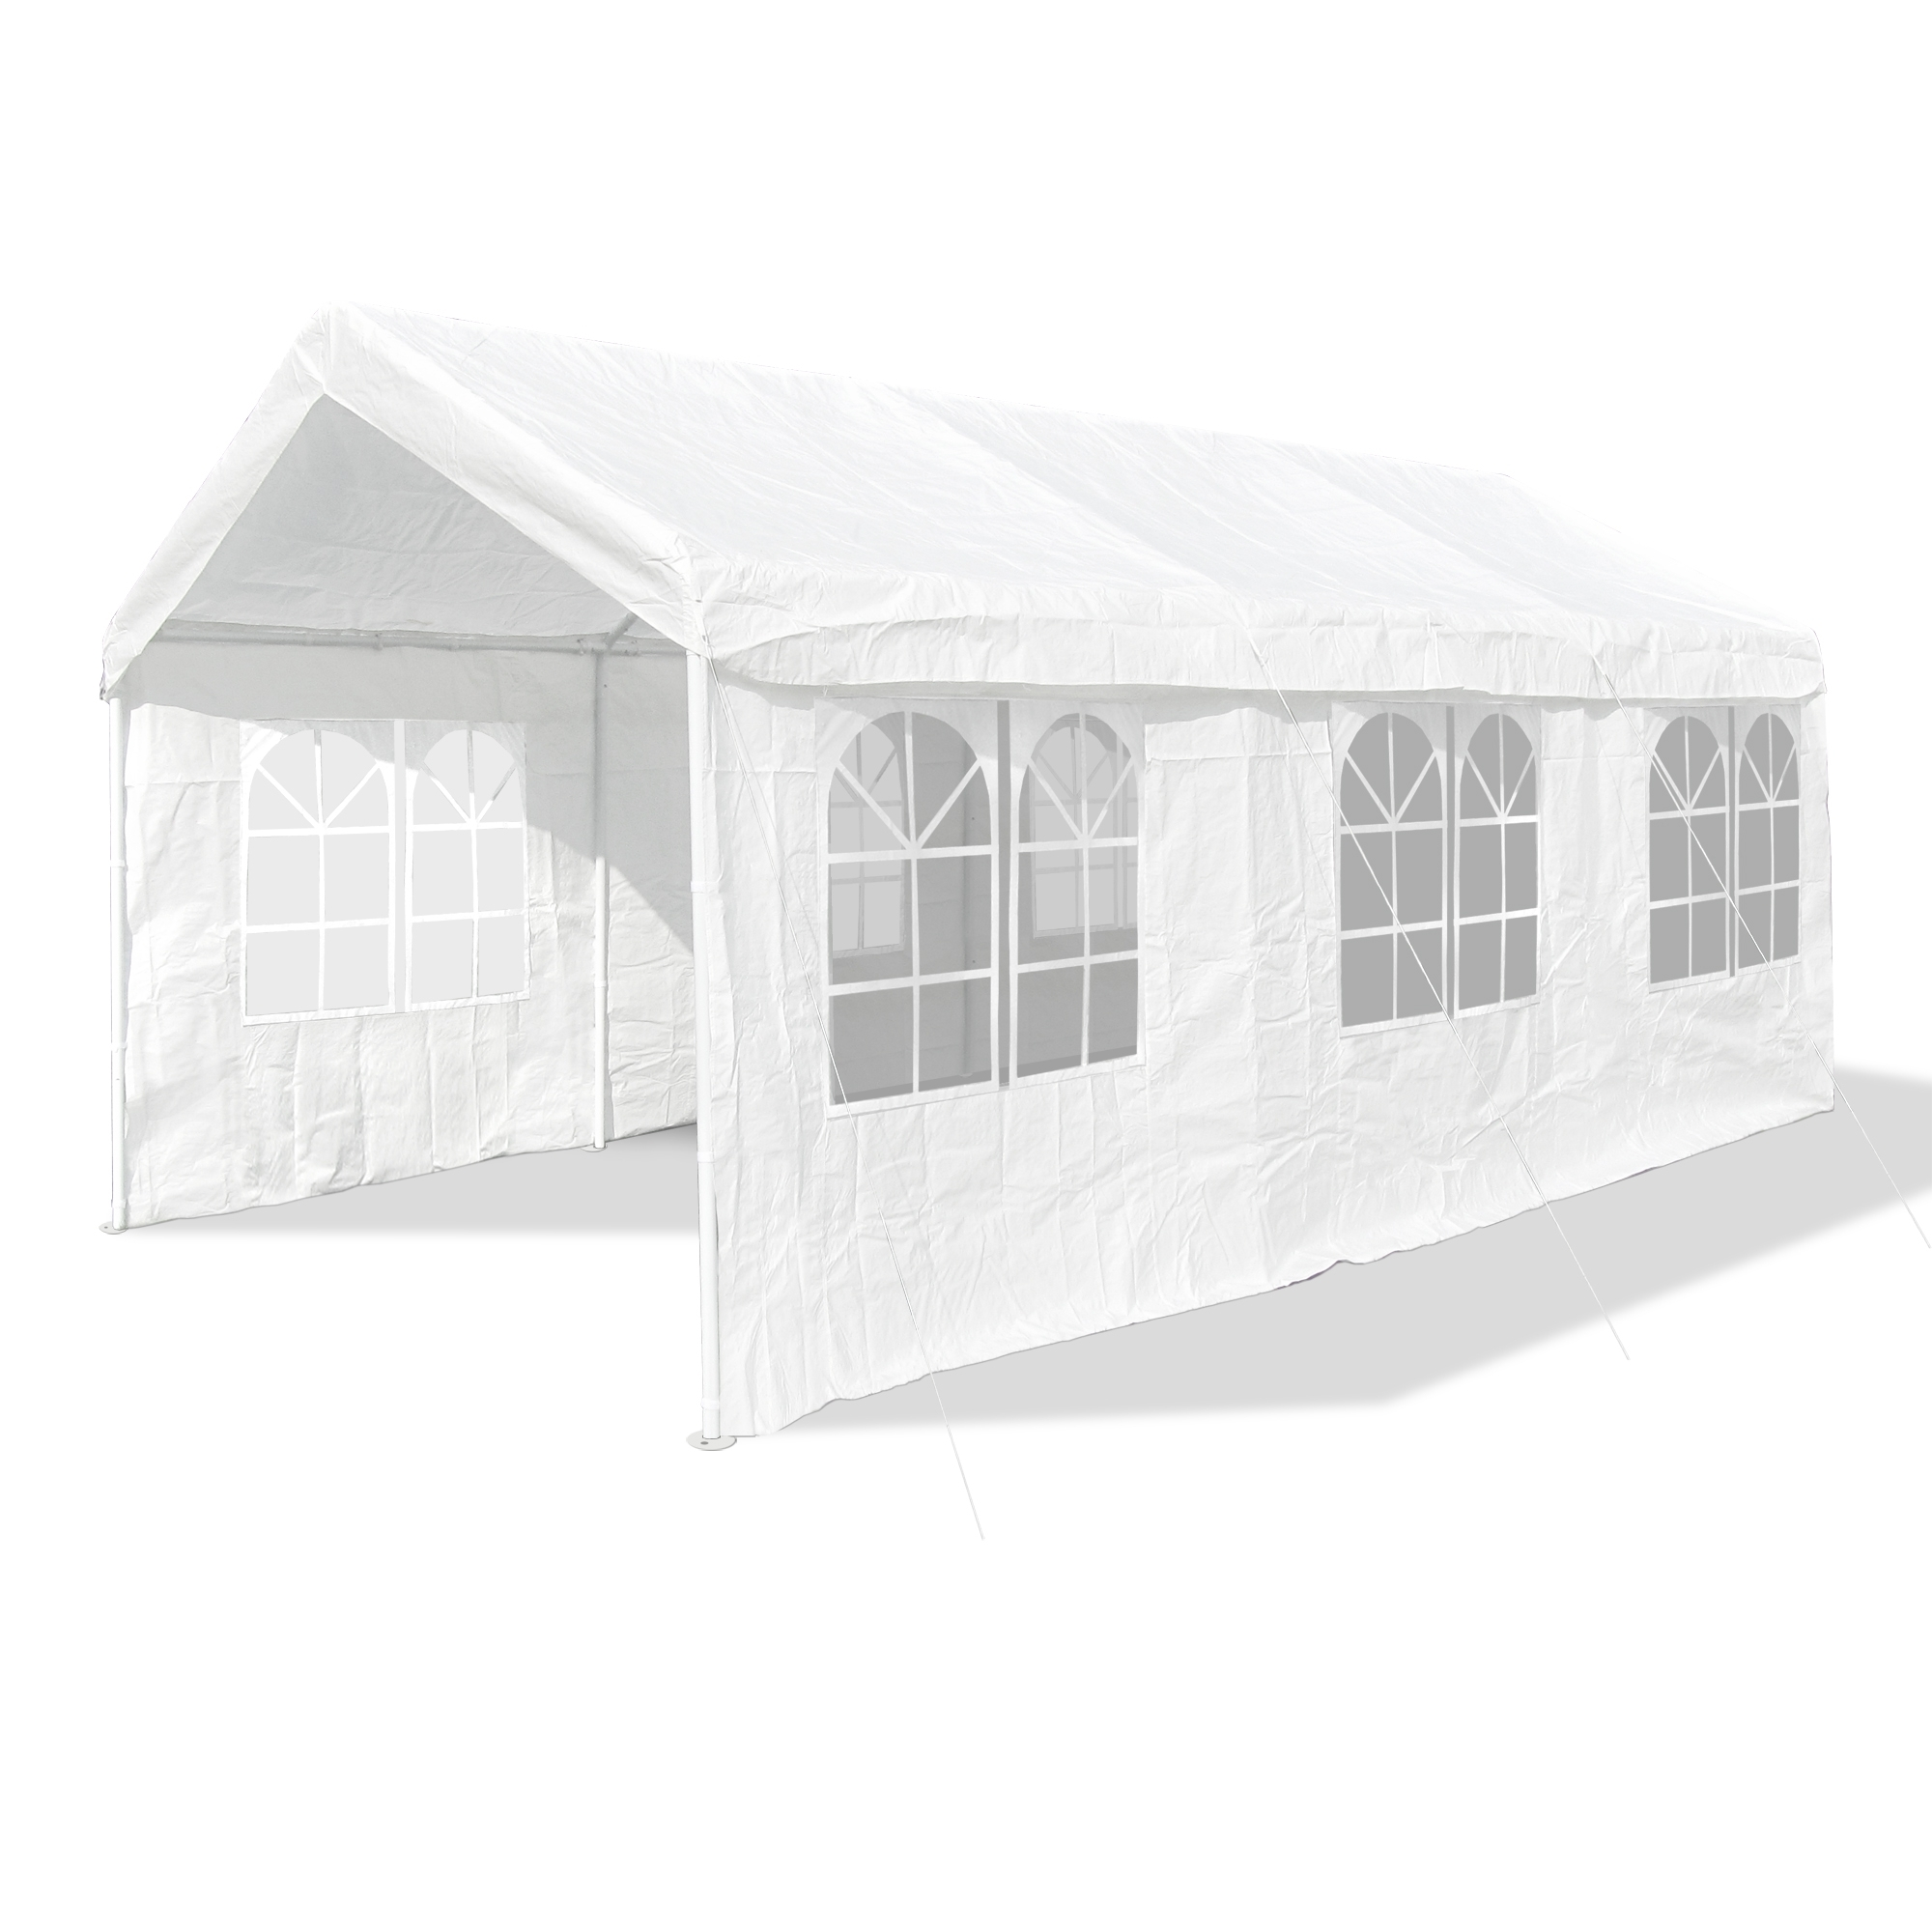 gartenpavillon xxl 3 x 6 m profi pavillon pavillion partyzelt festzelt gartenzelt 38er. Black Bedroom Furniture Sets. Home Design Ideas